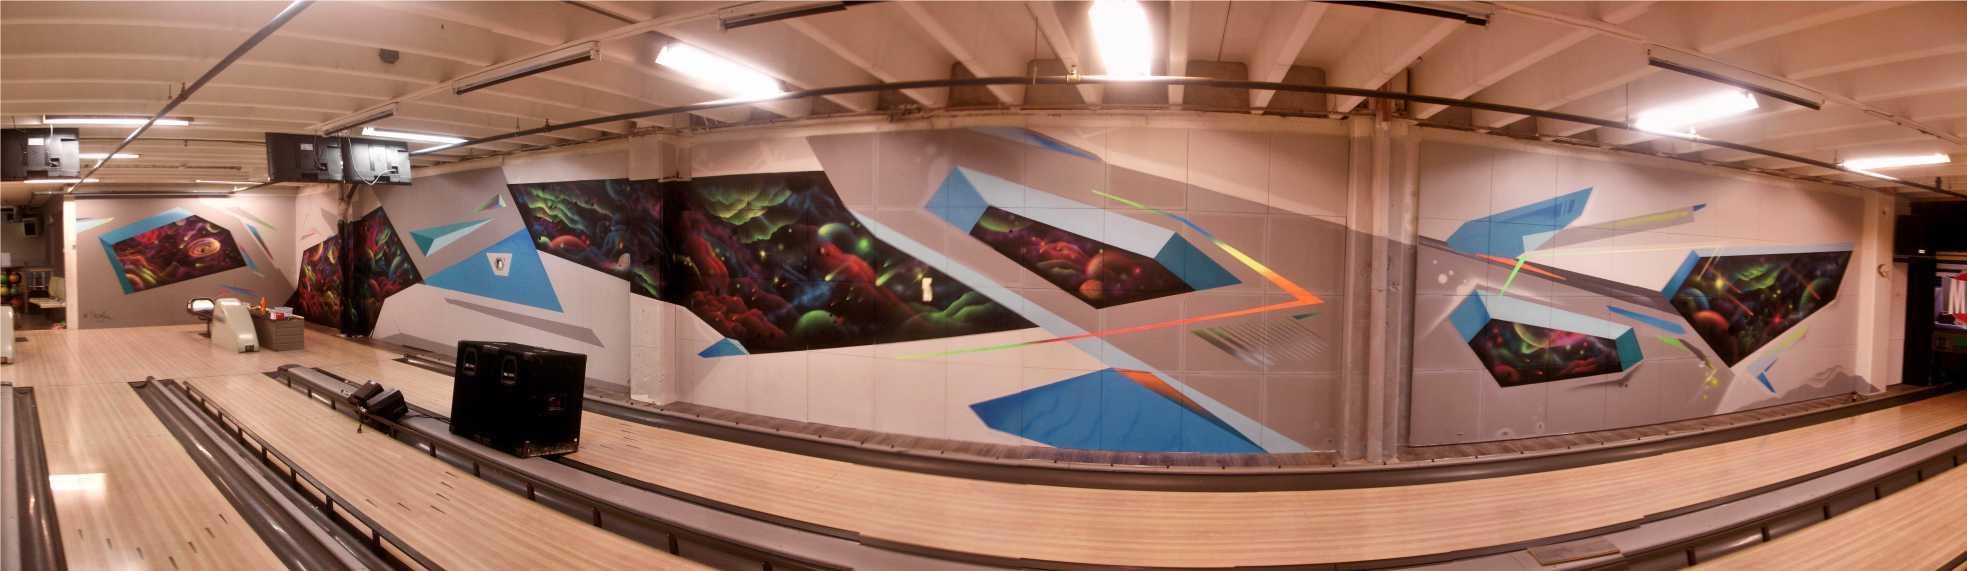 Selvlysende graffiti Askøy bowling